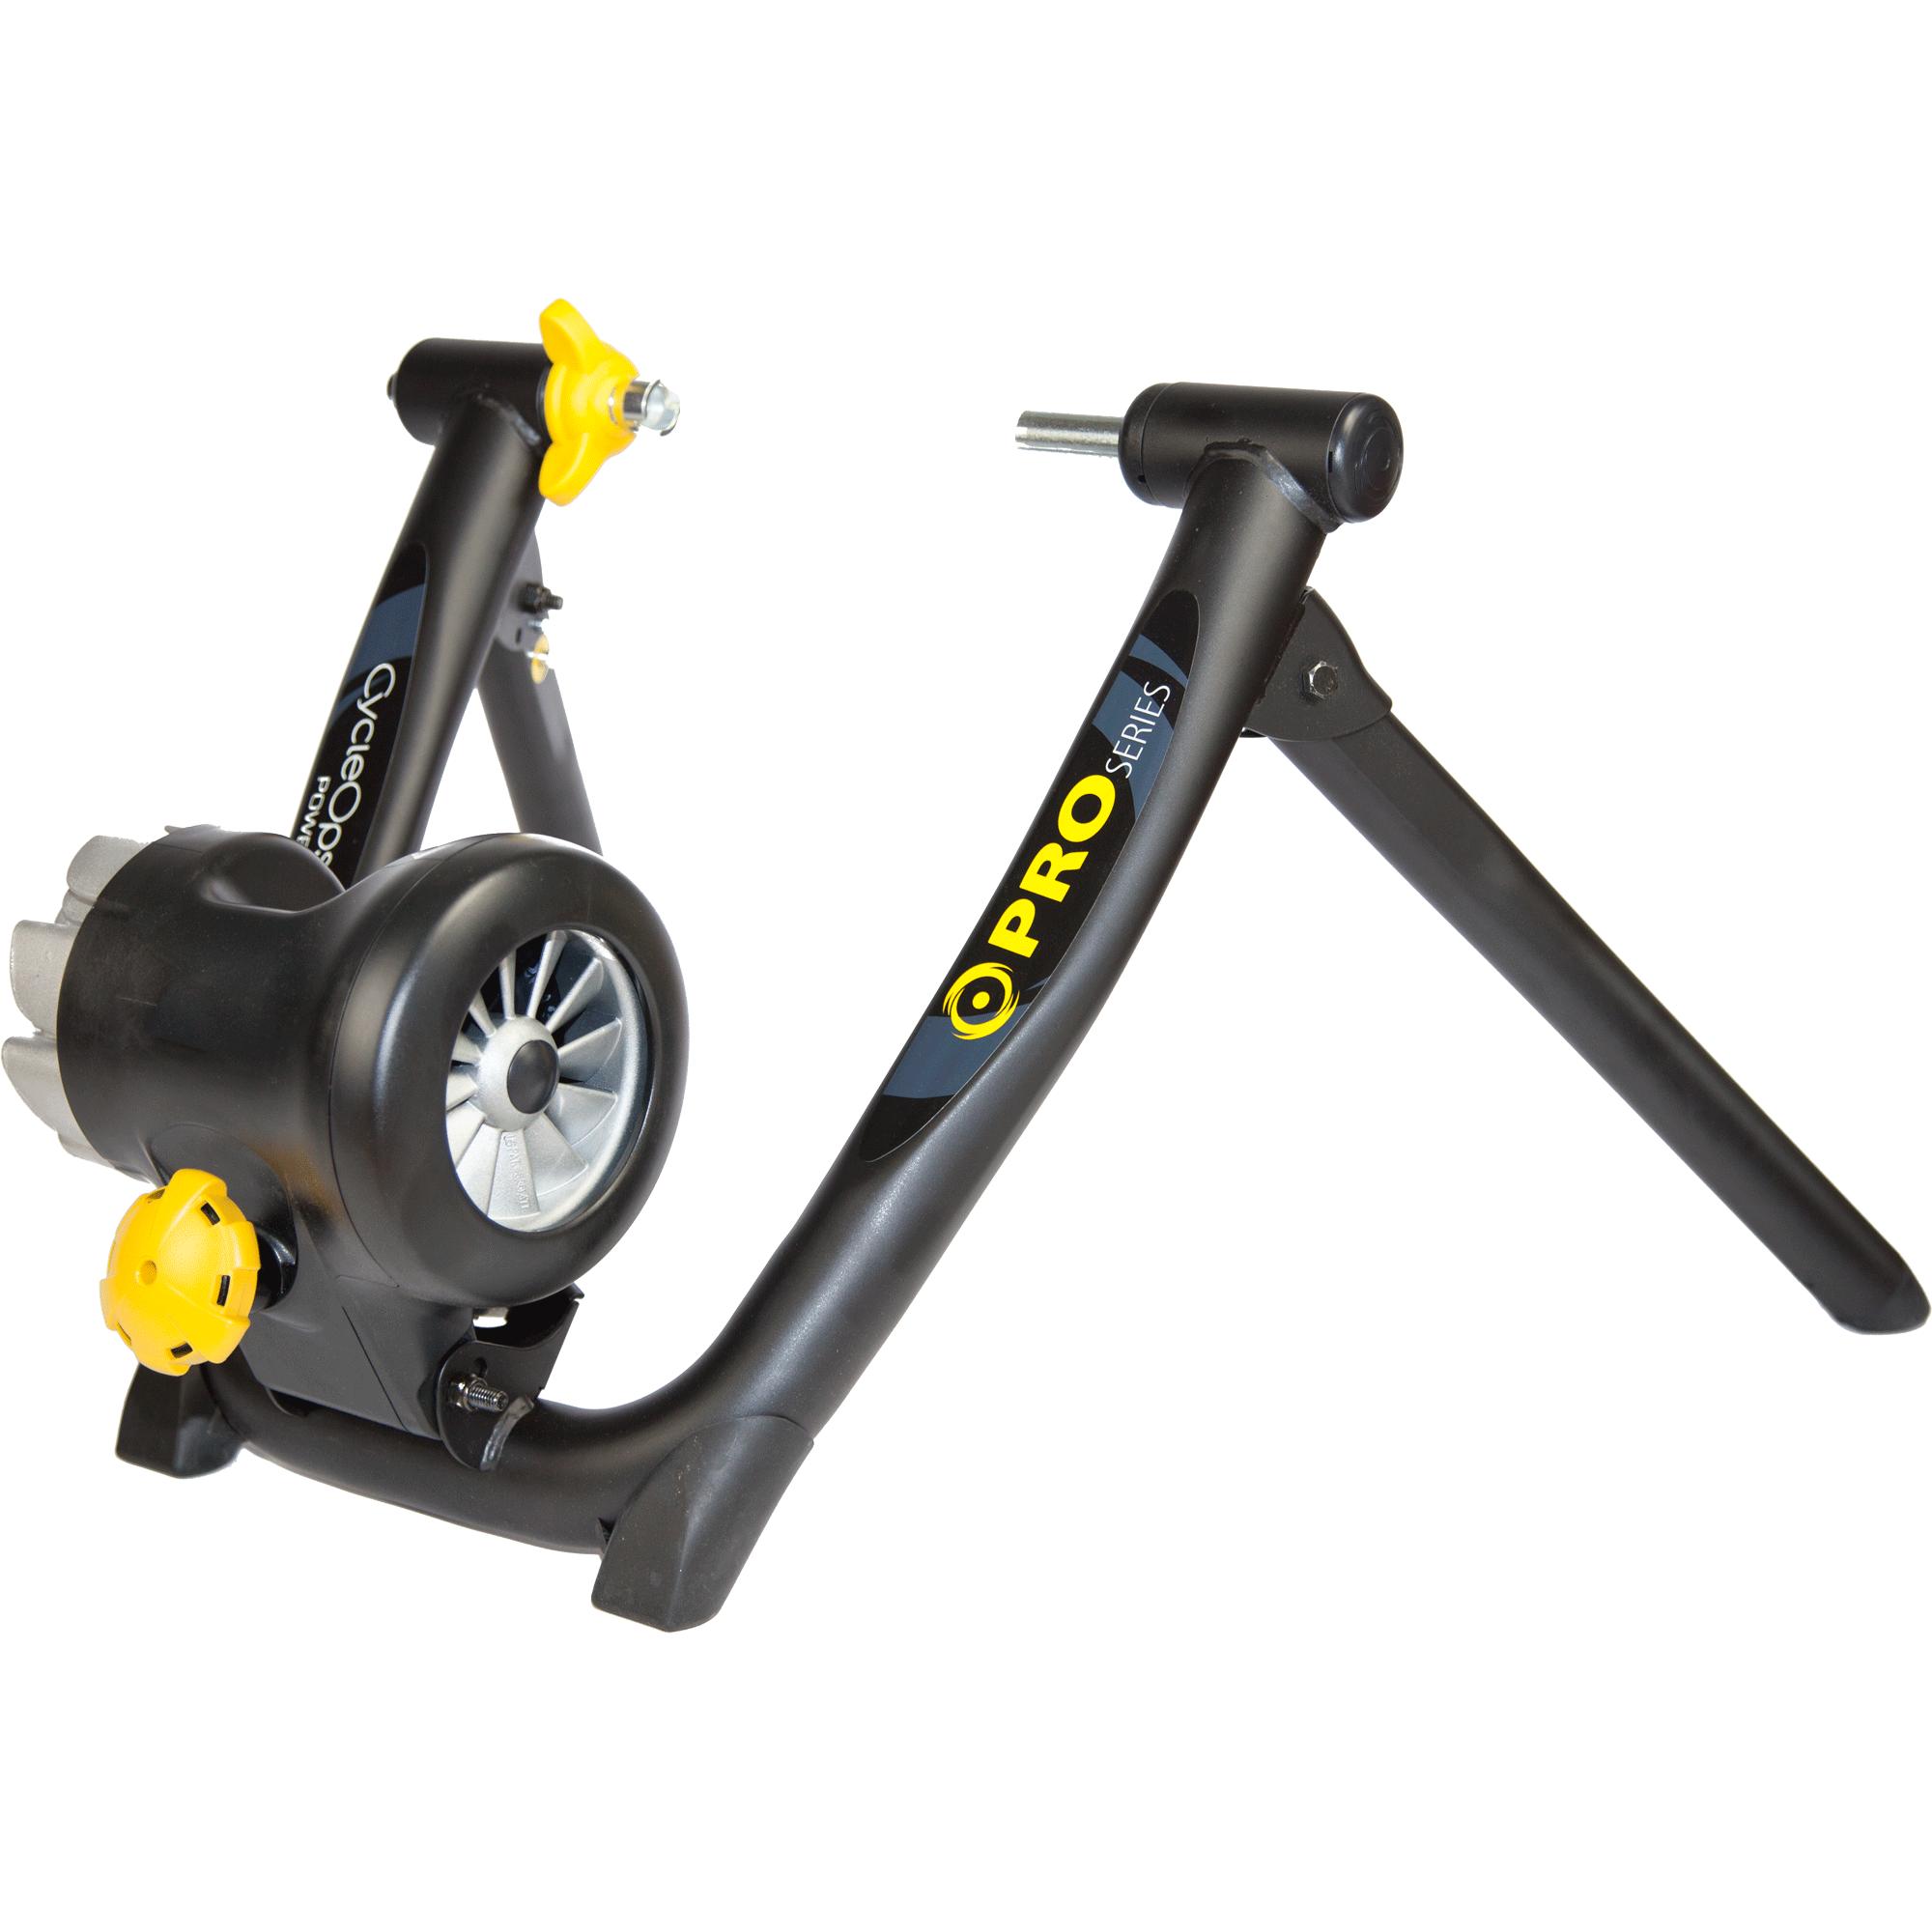 CycleOps Jetfluid Trainer